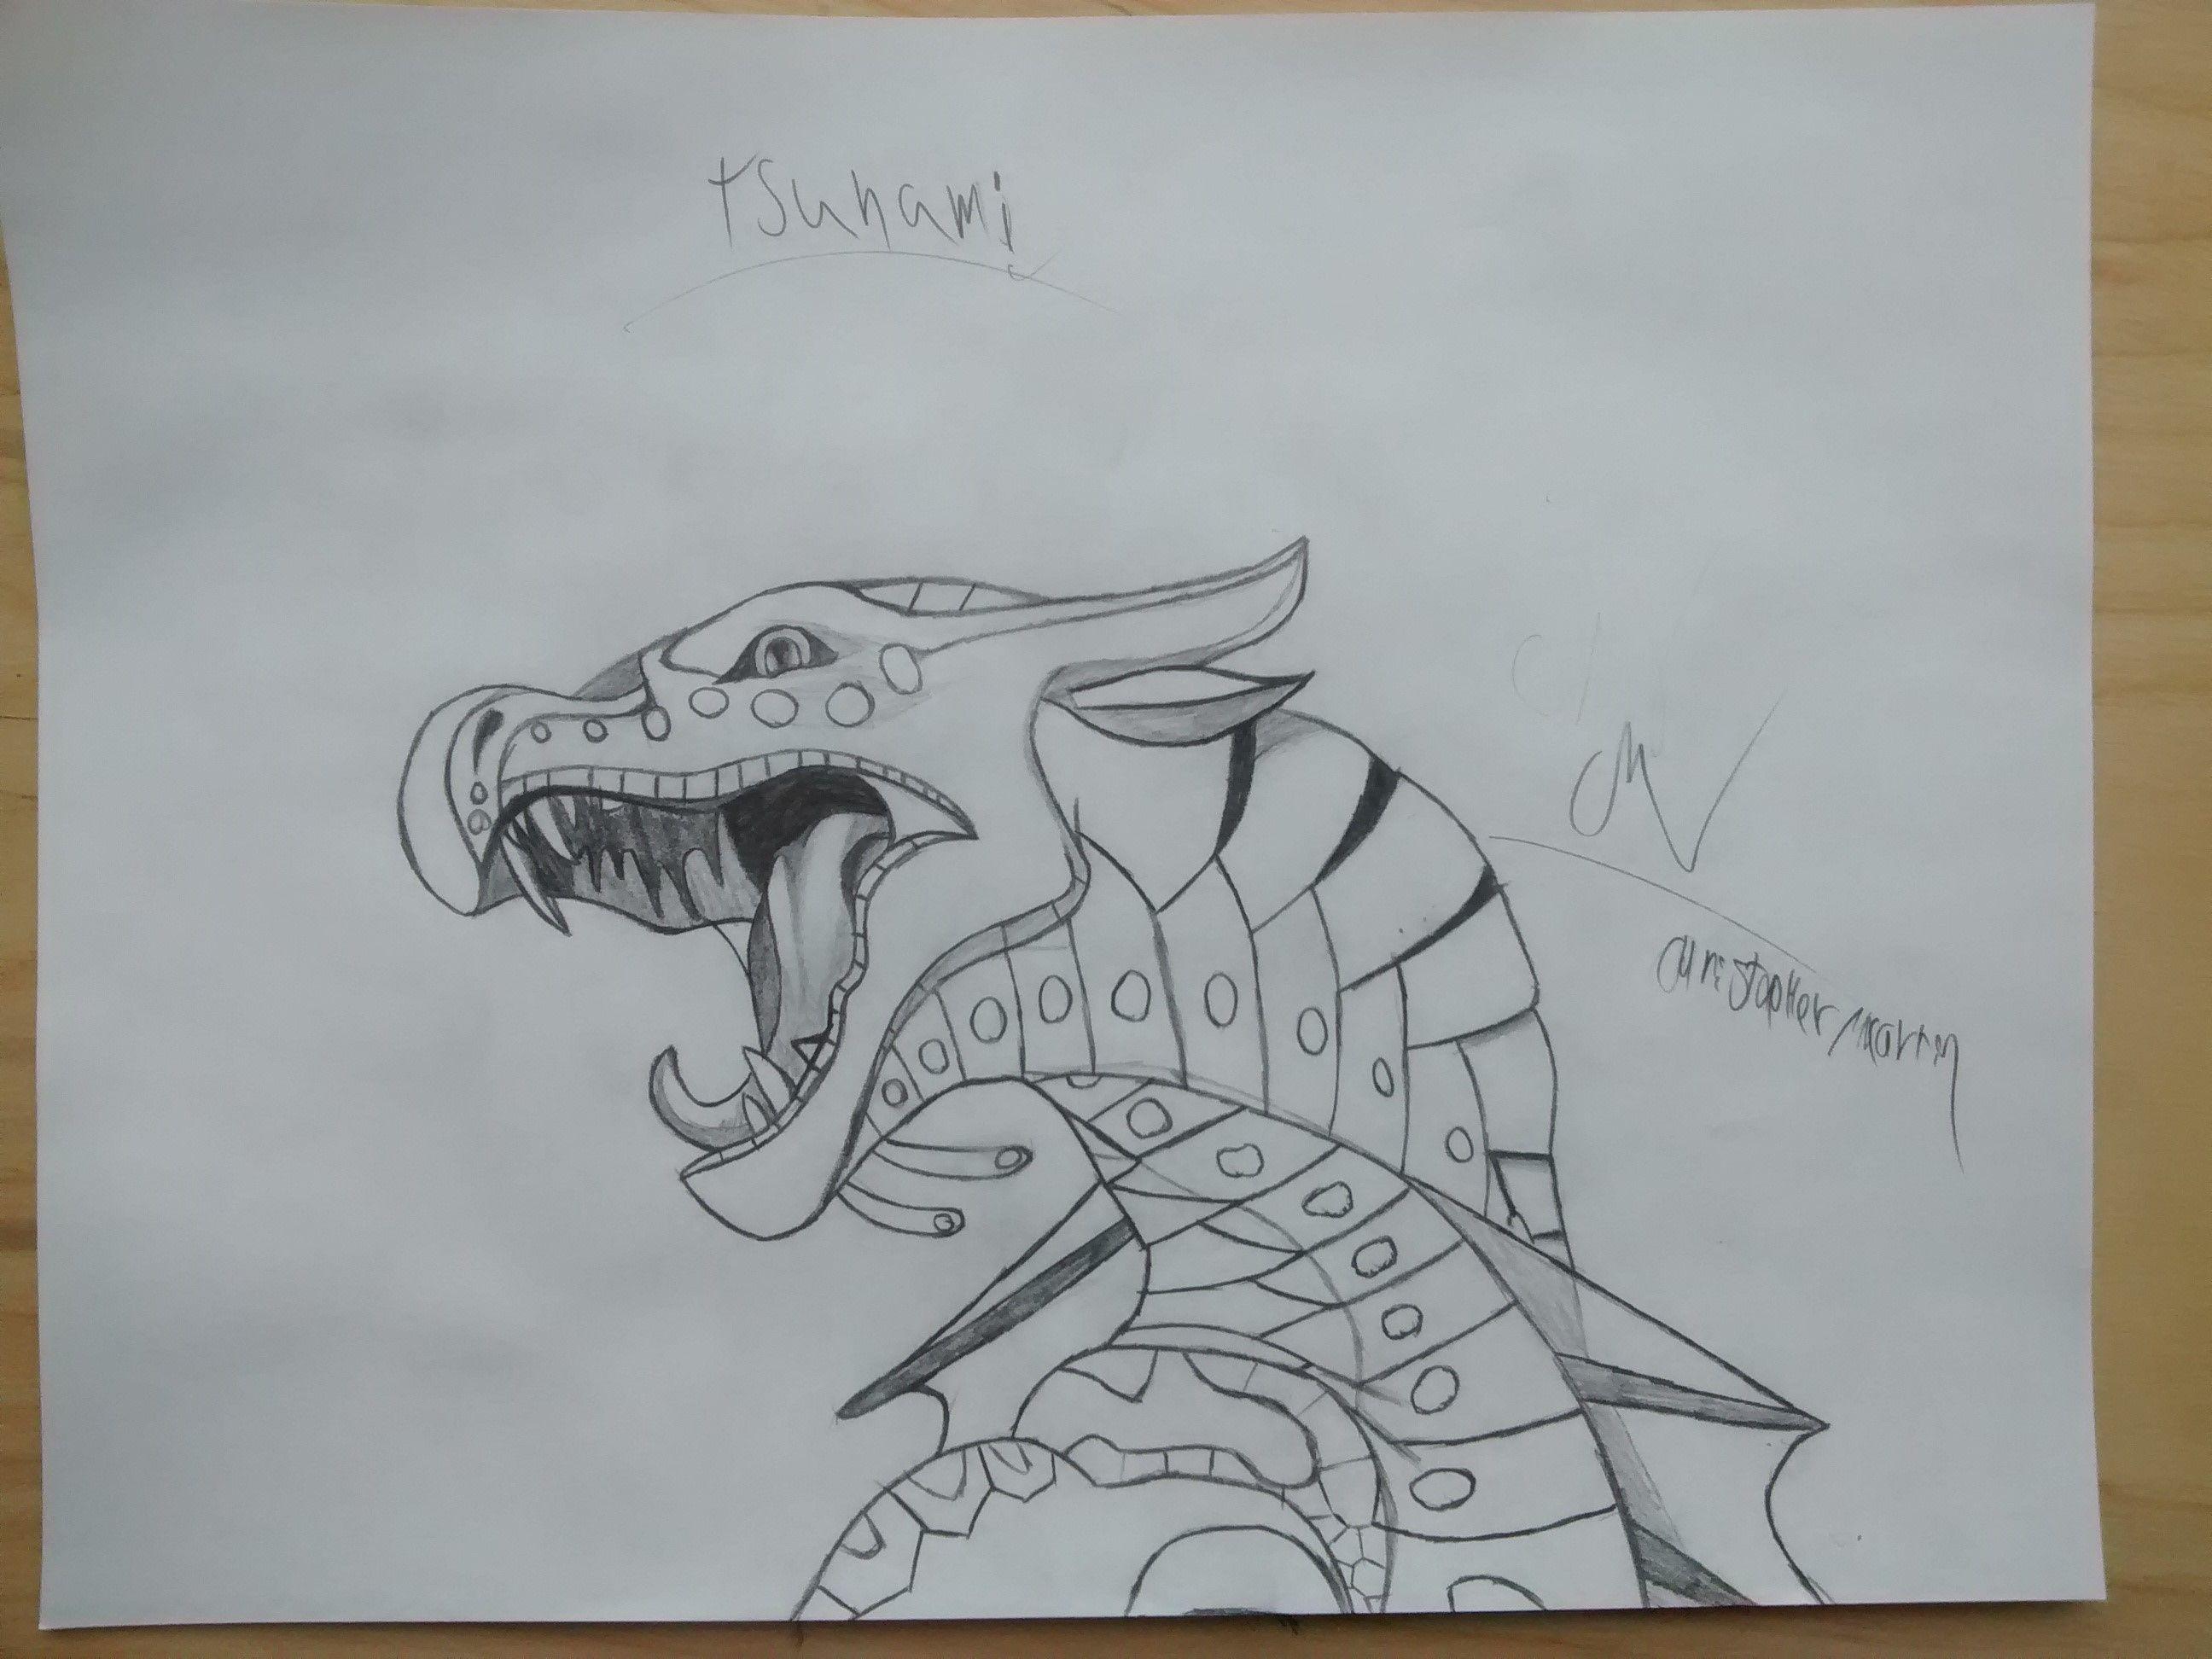 2592x1944 My New Drawing Of Tsunami The Seawings. Mon Nouveau Dessin De